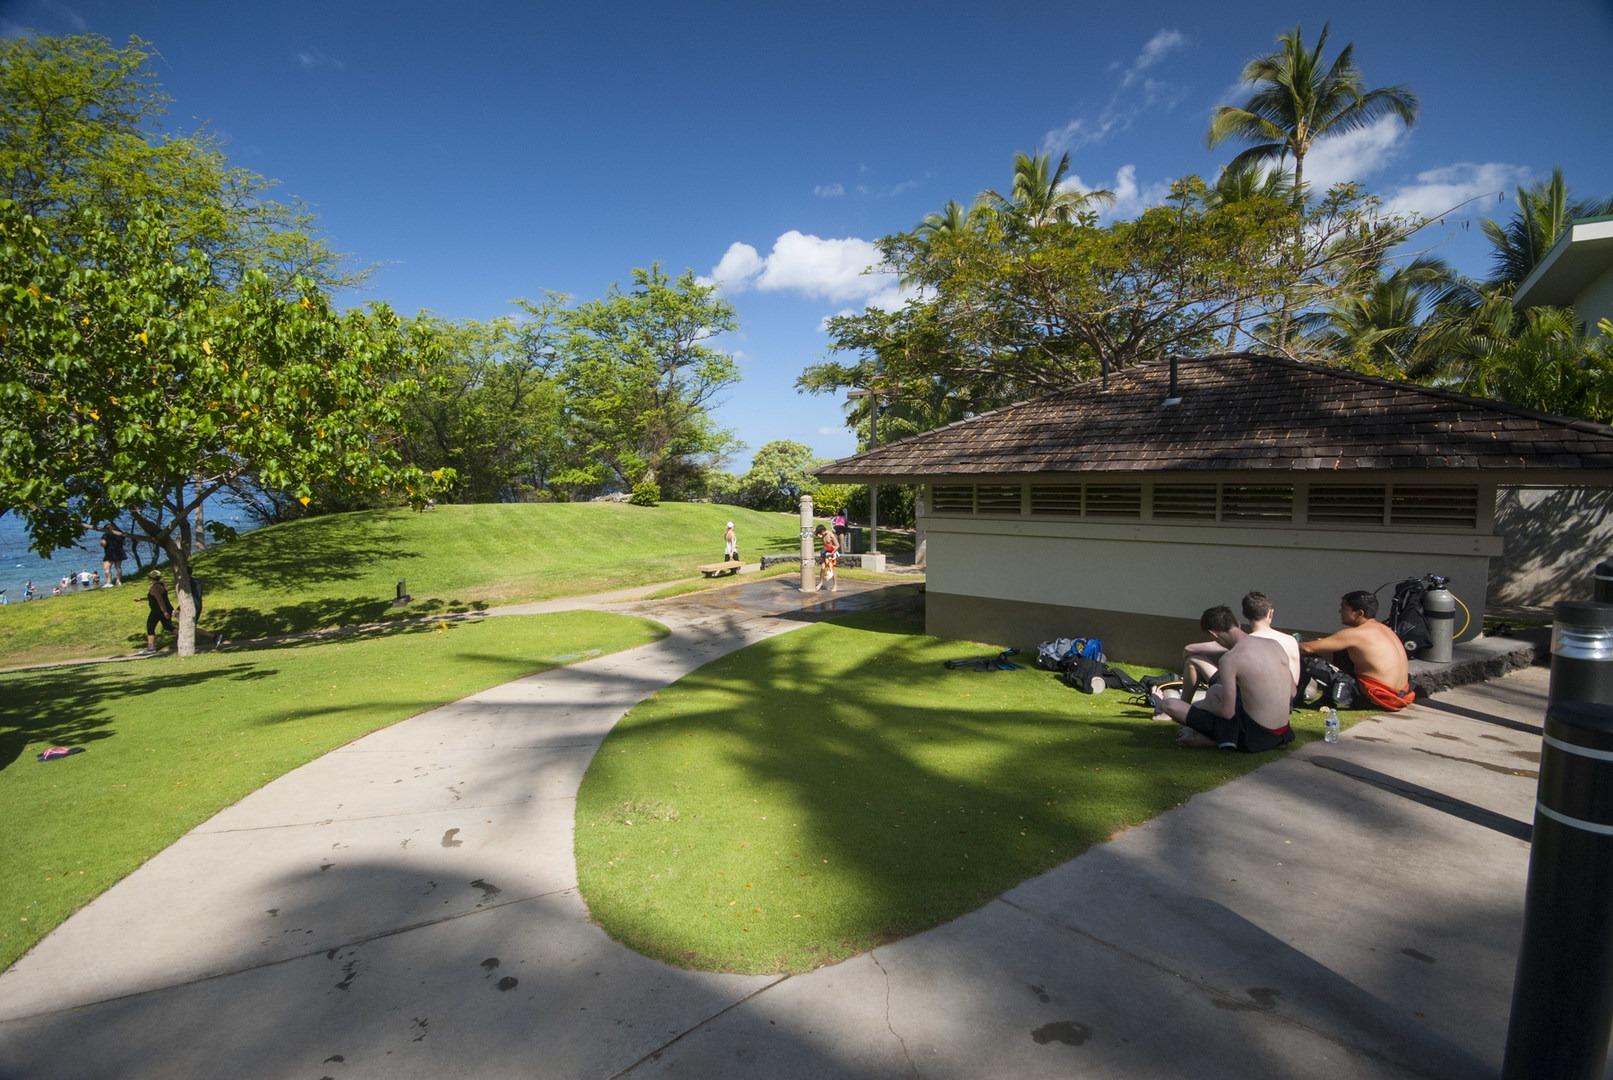 Public Restrooms And Showers At Ulua Beach Mokapu Park